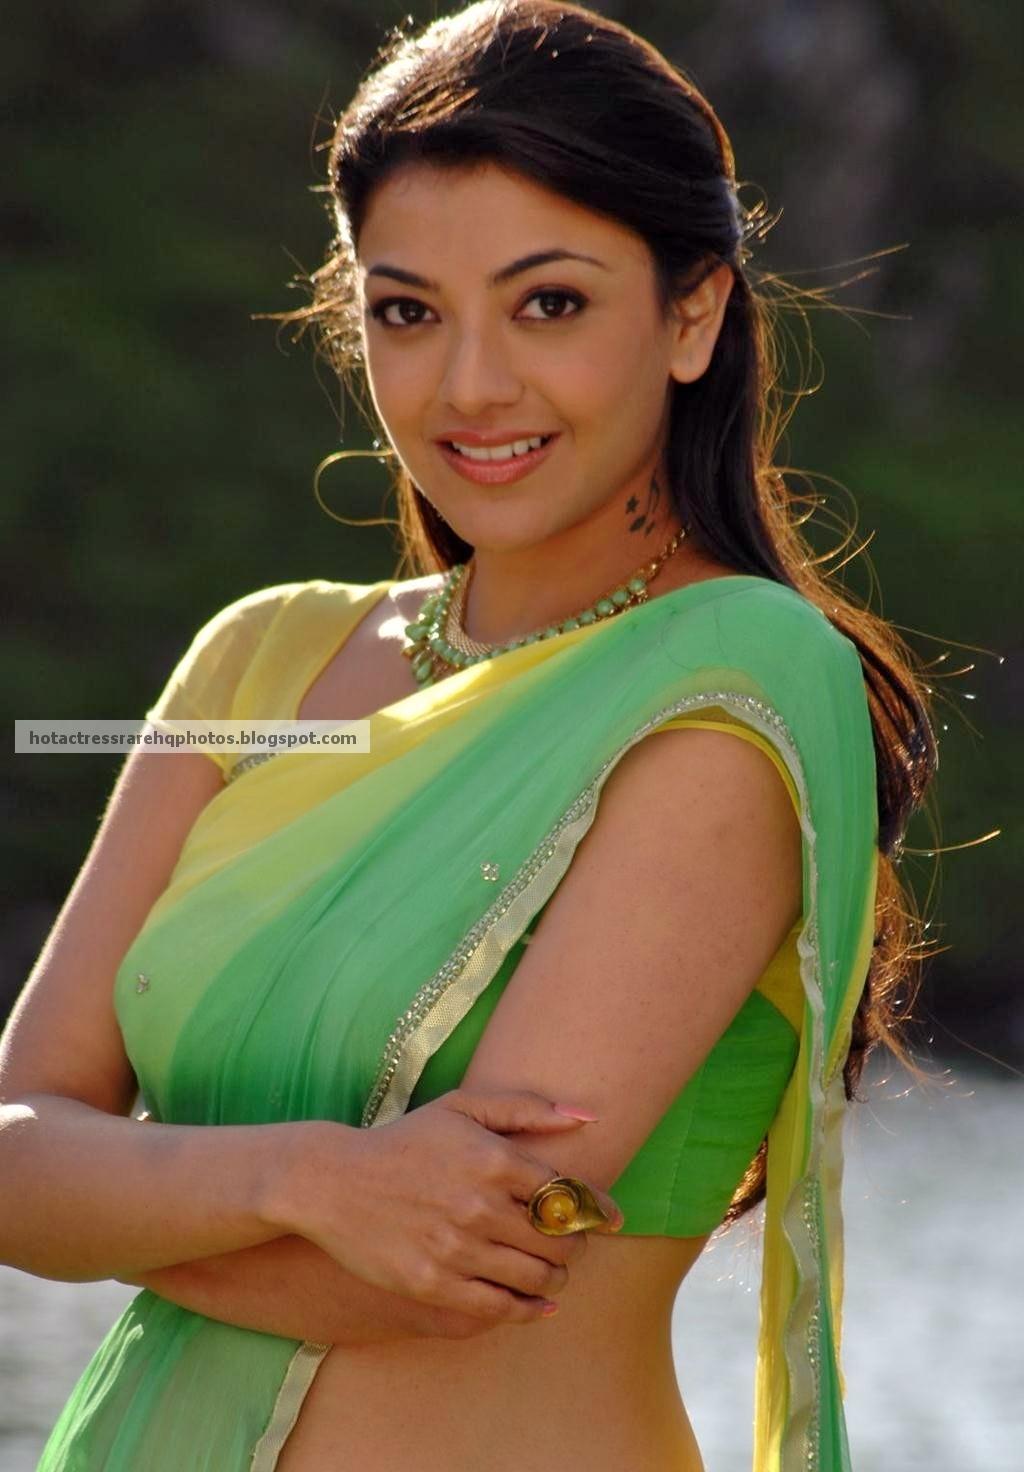 Sari dance full time masti just for fun 2